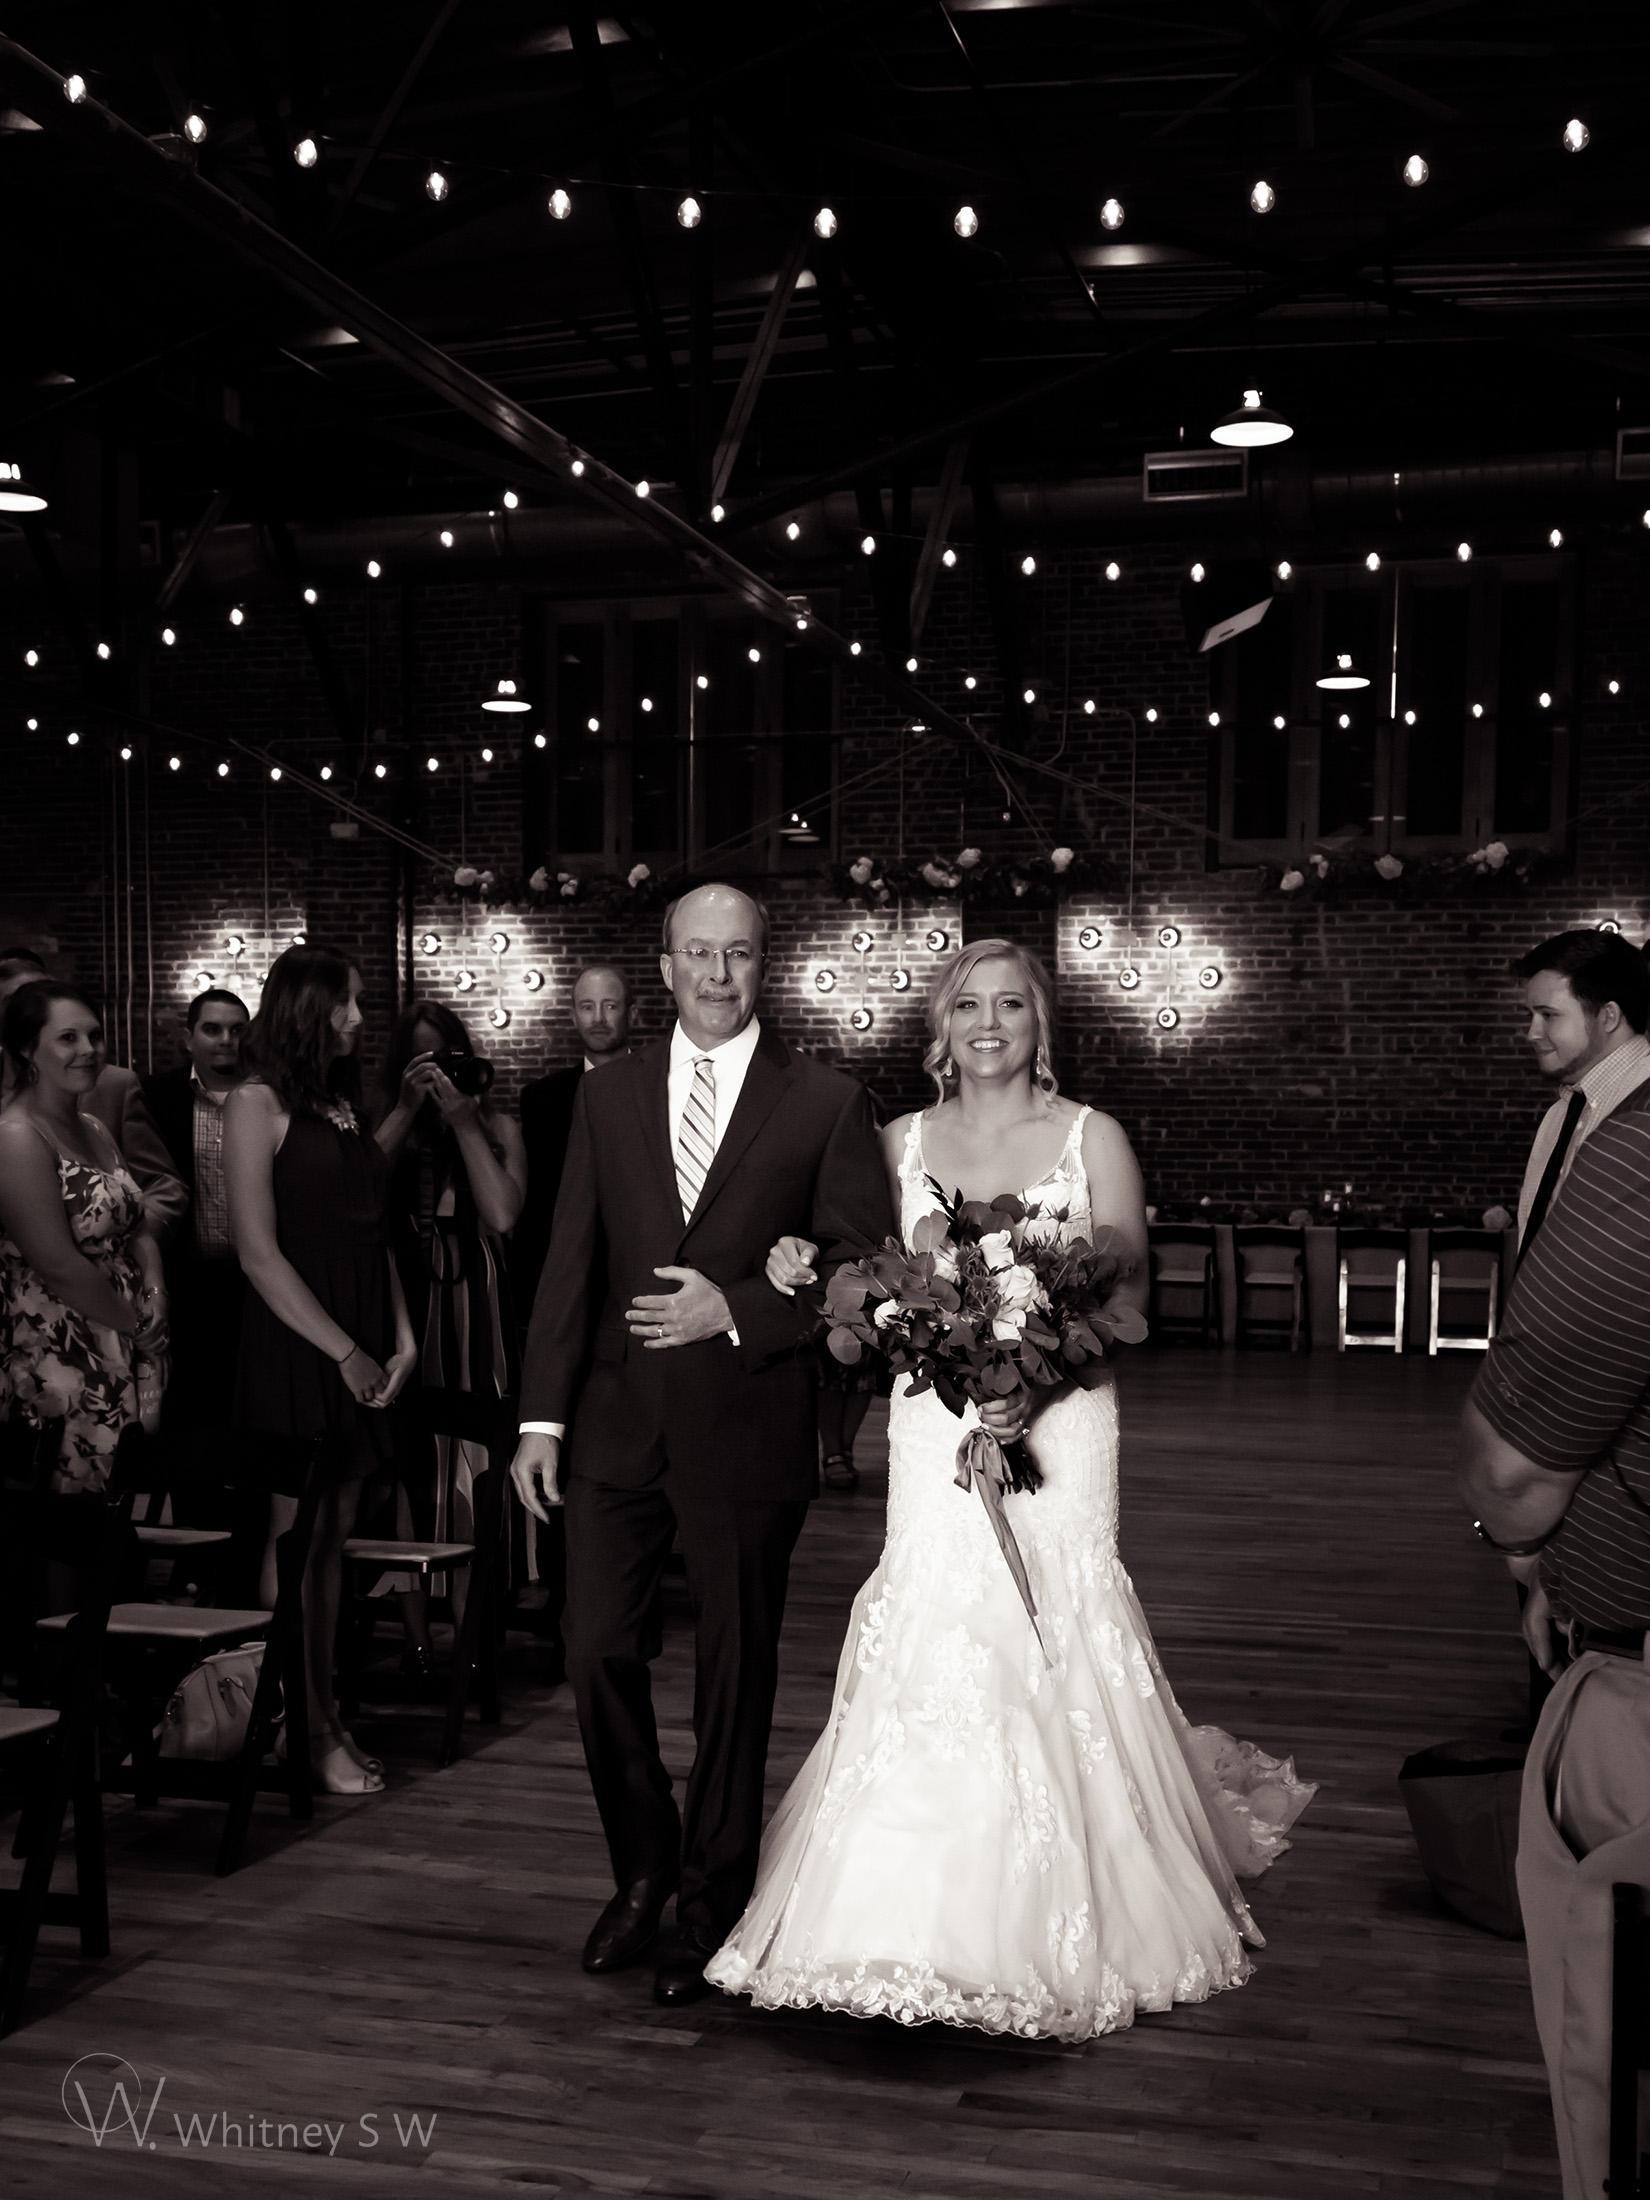 Morgan & Kaivon Wedding - Photography by Whitney S Williams whitneysw (43).jpg